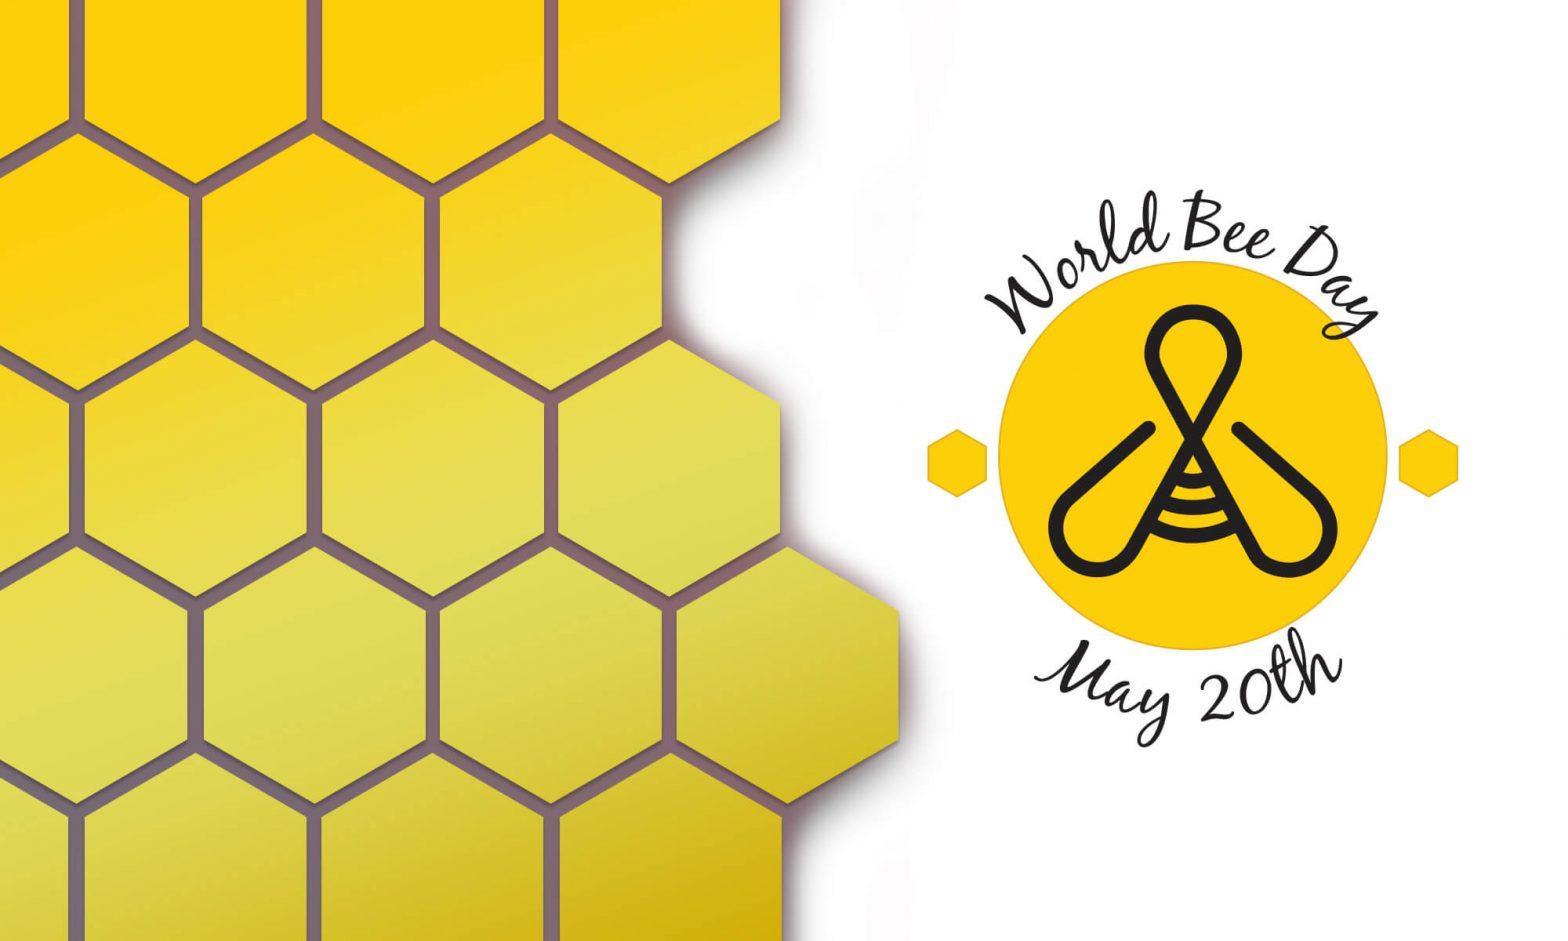 World Bee Day observed globally on 20th May | 20 মে বিশ্বব্যাপী মৌমাছি দিবস পালন করা হল_40.1